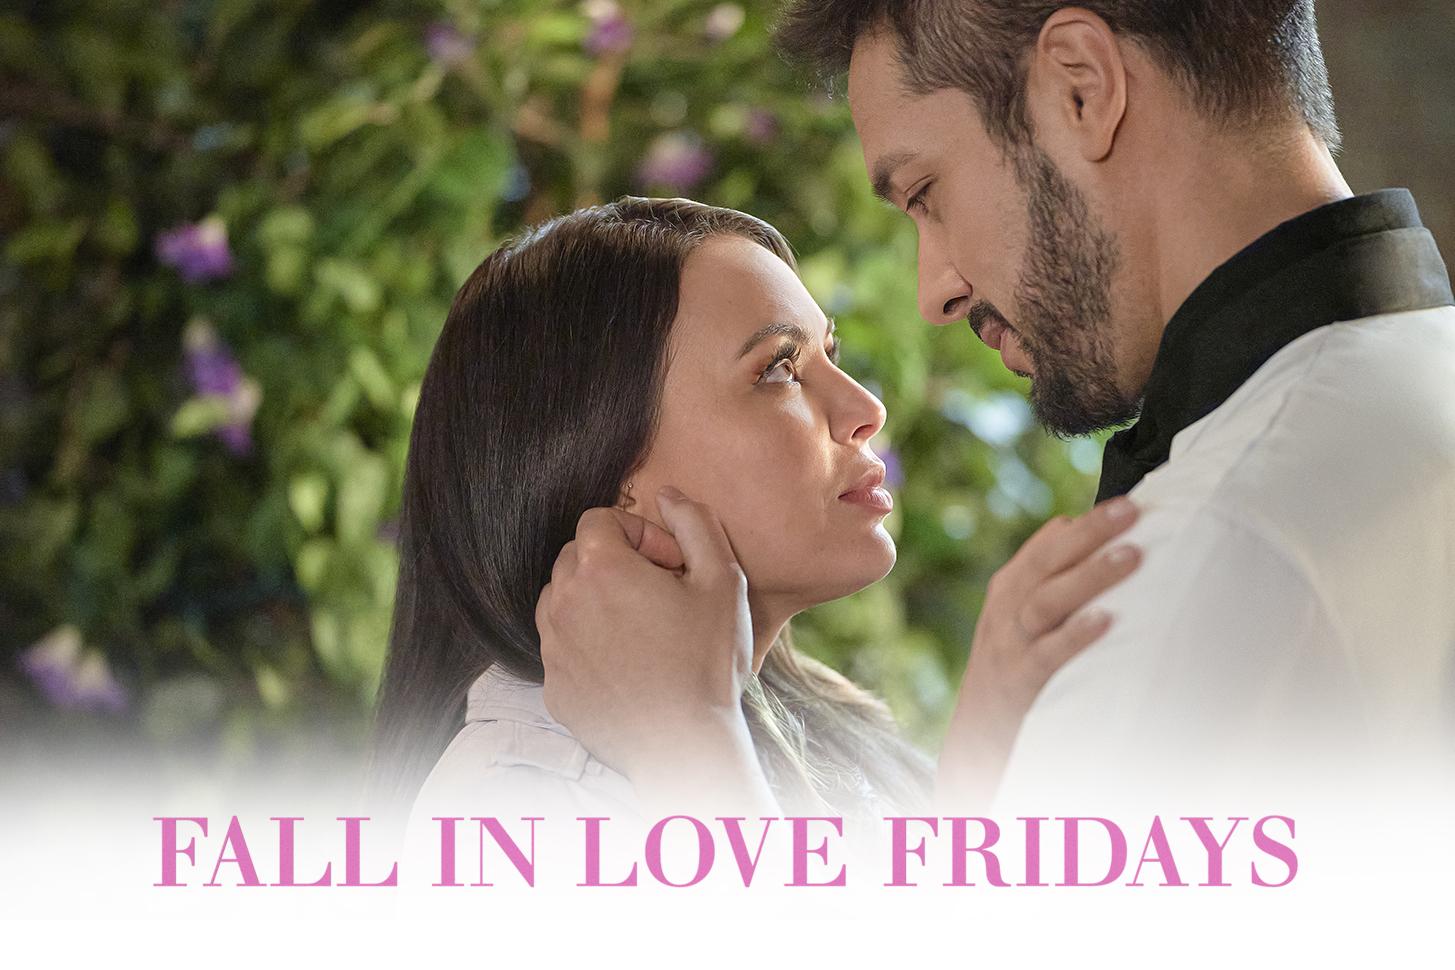 Fall in Love Fridays